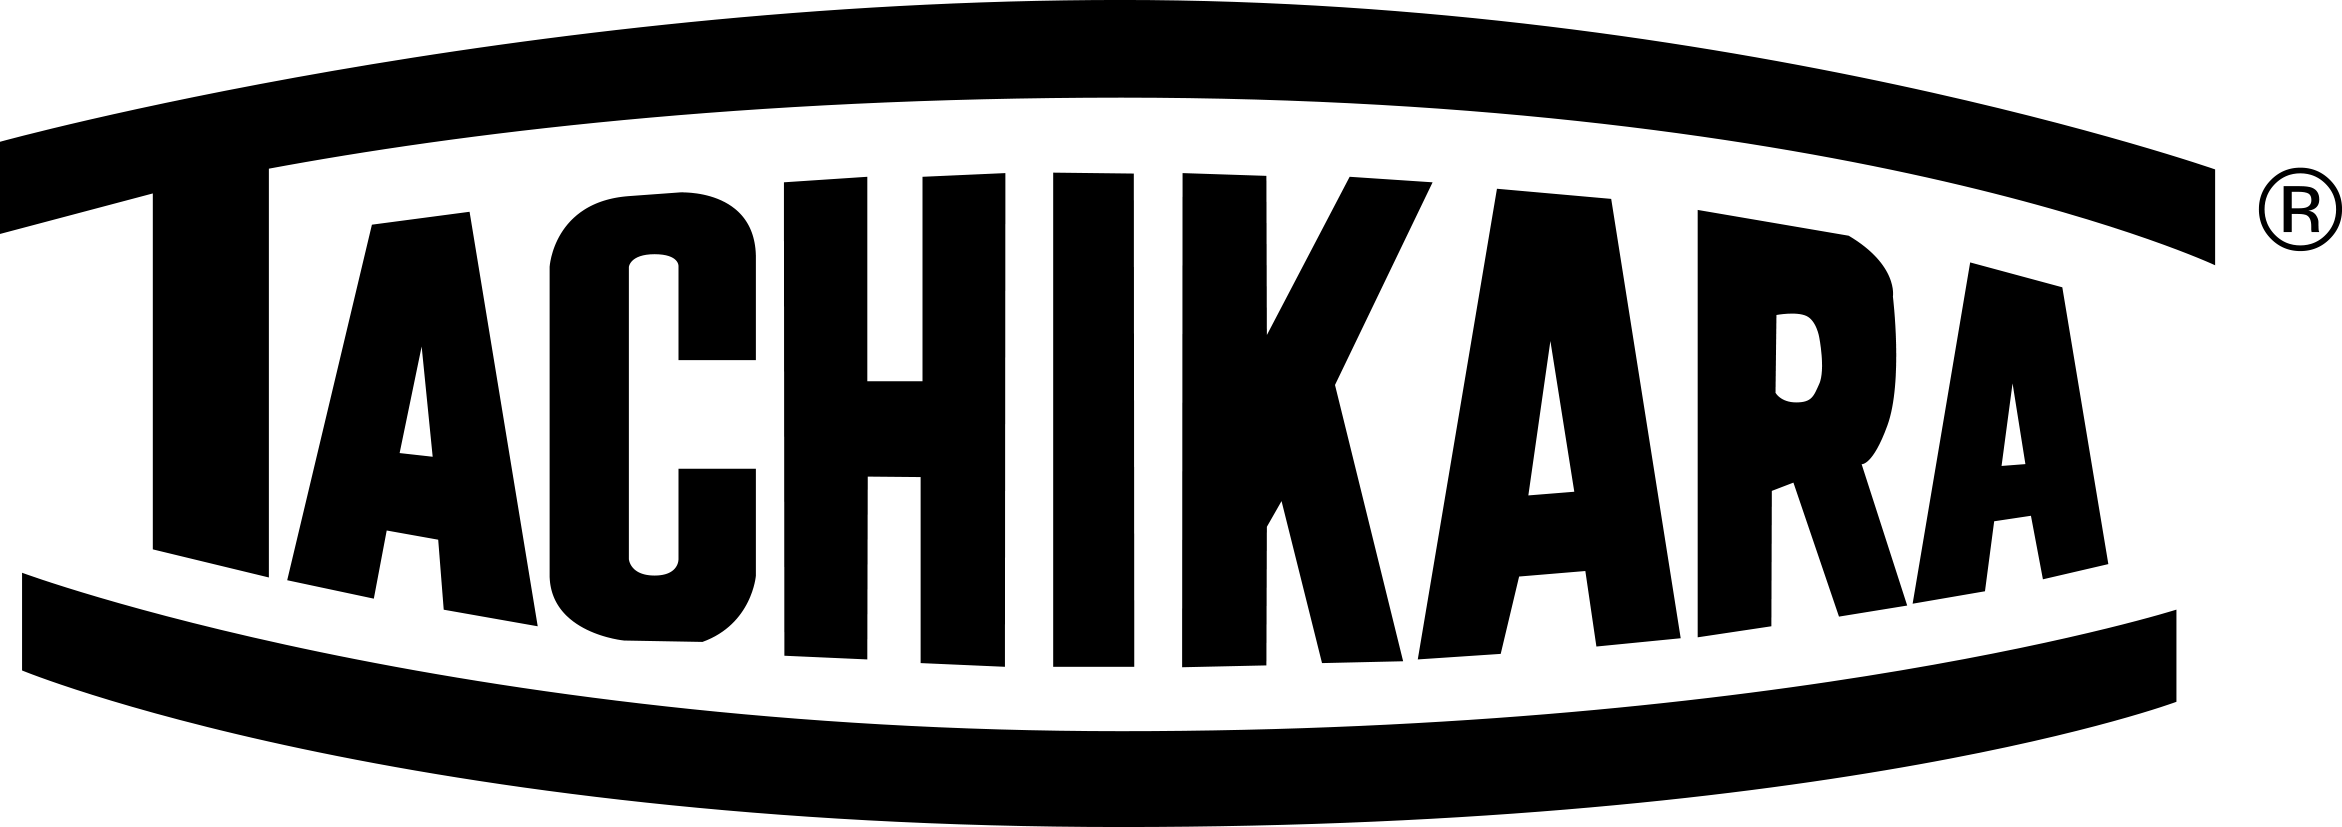 TACH-LOGO-BLACK.png